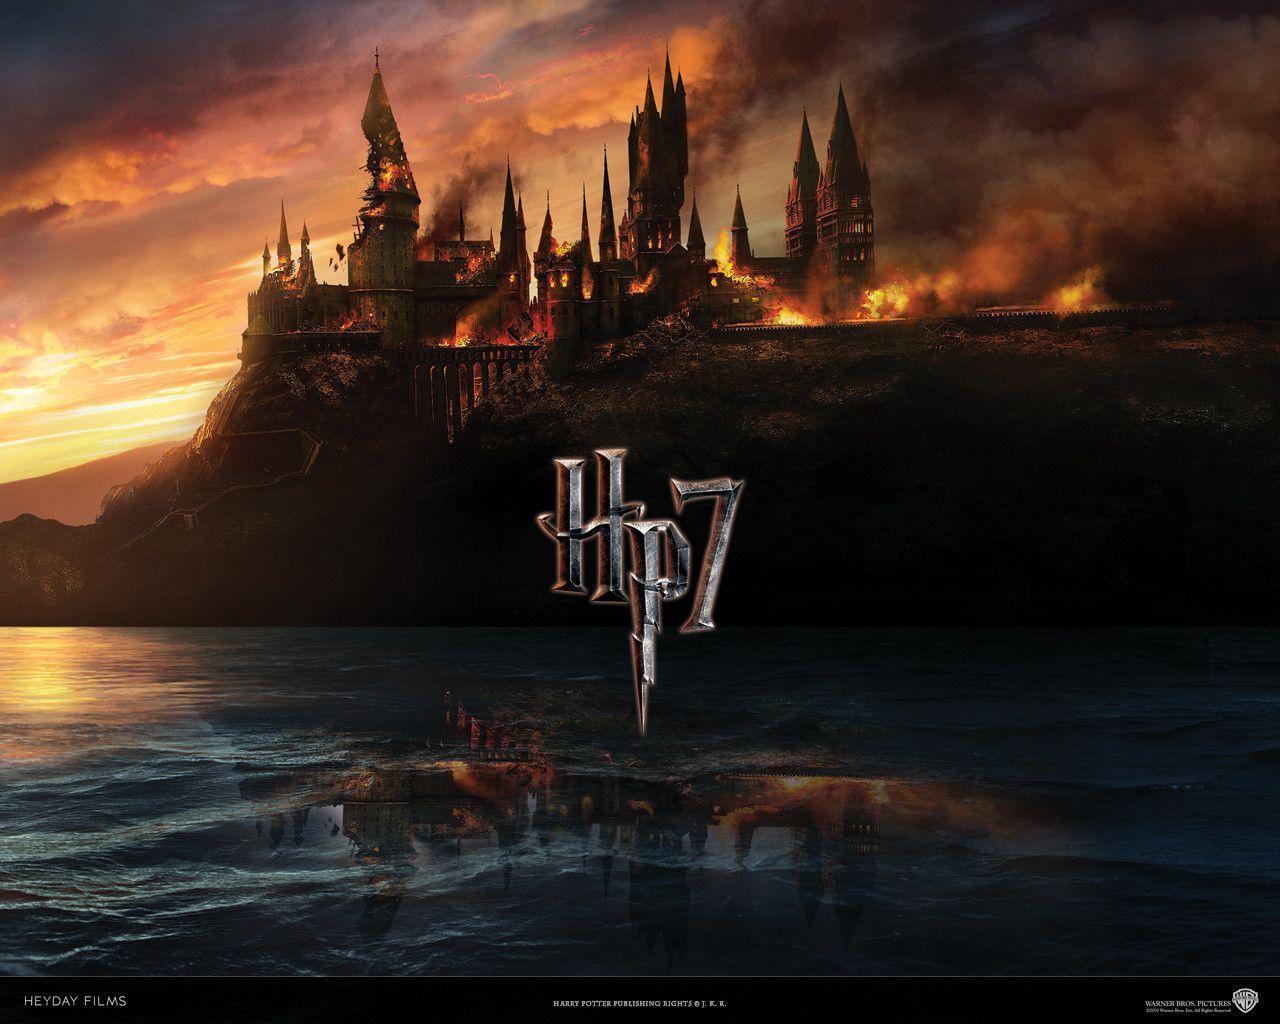 hogwarts wallpaper by sx2 - photo #21